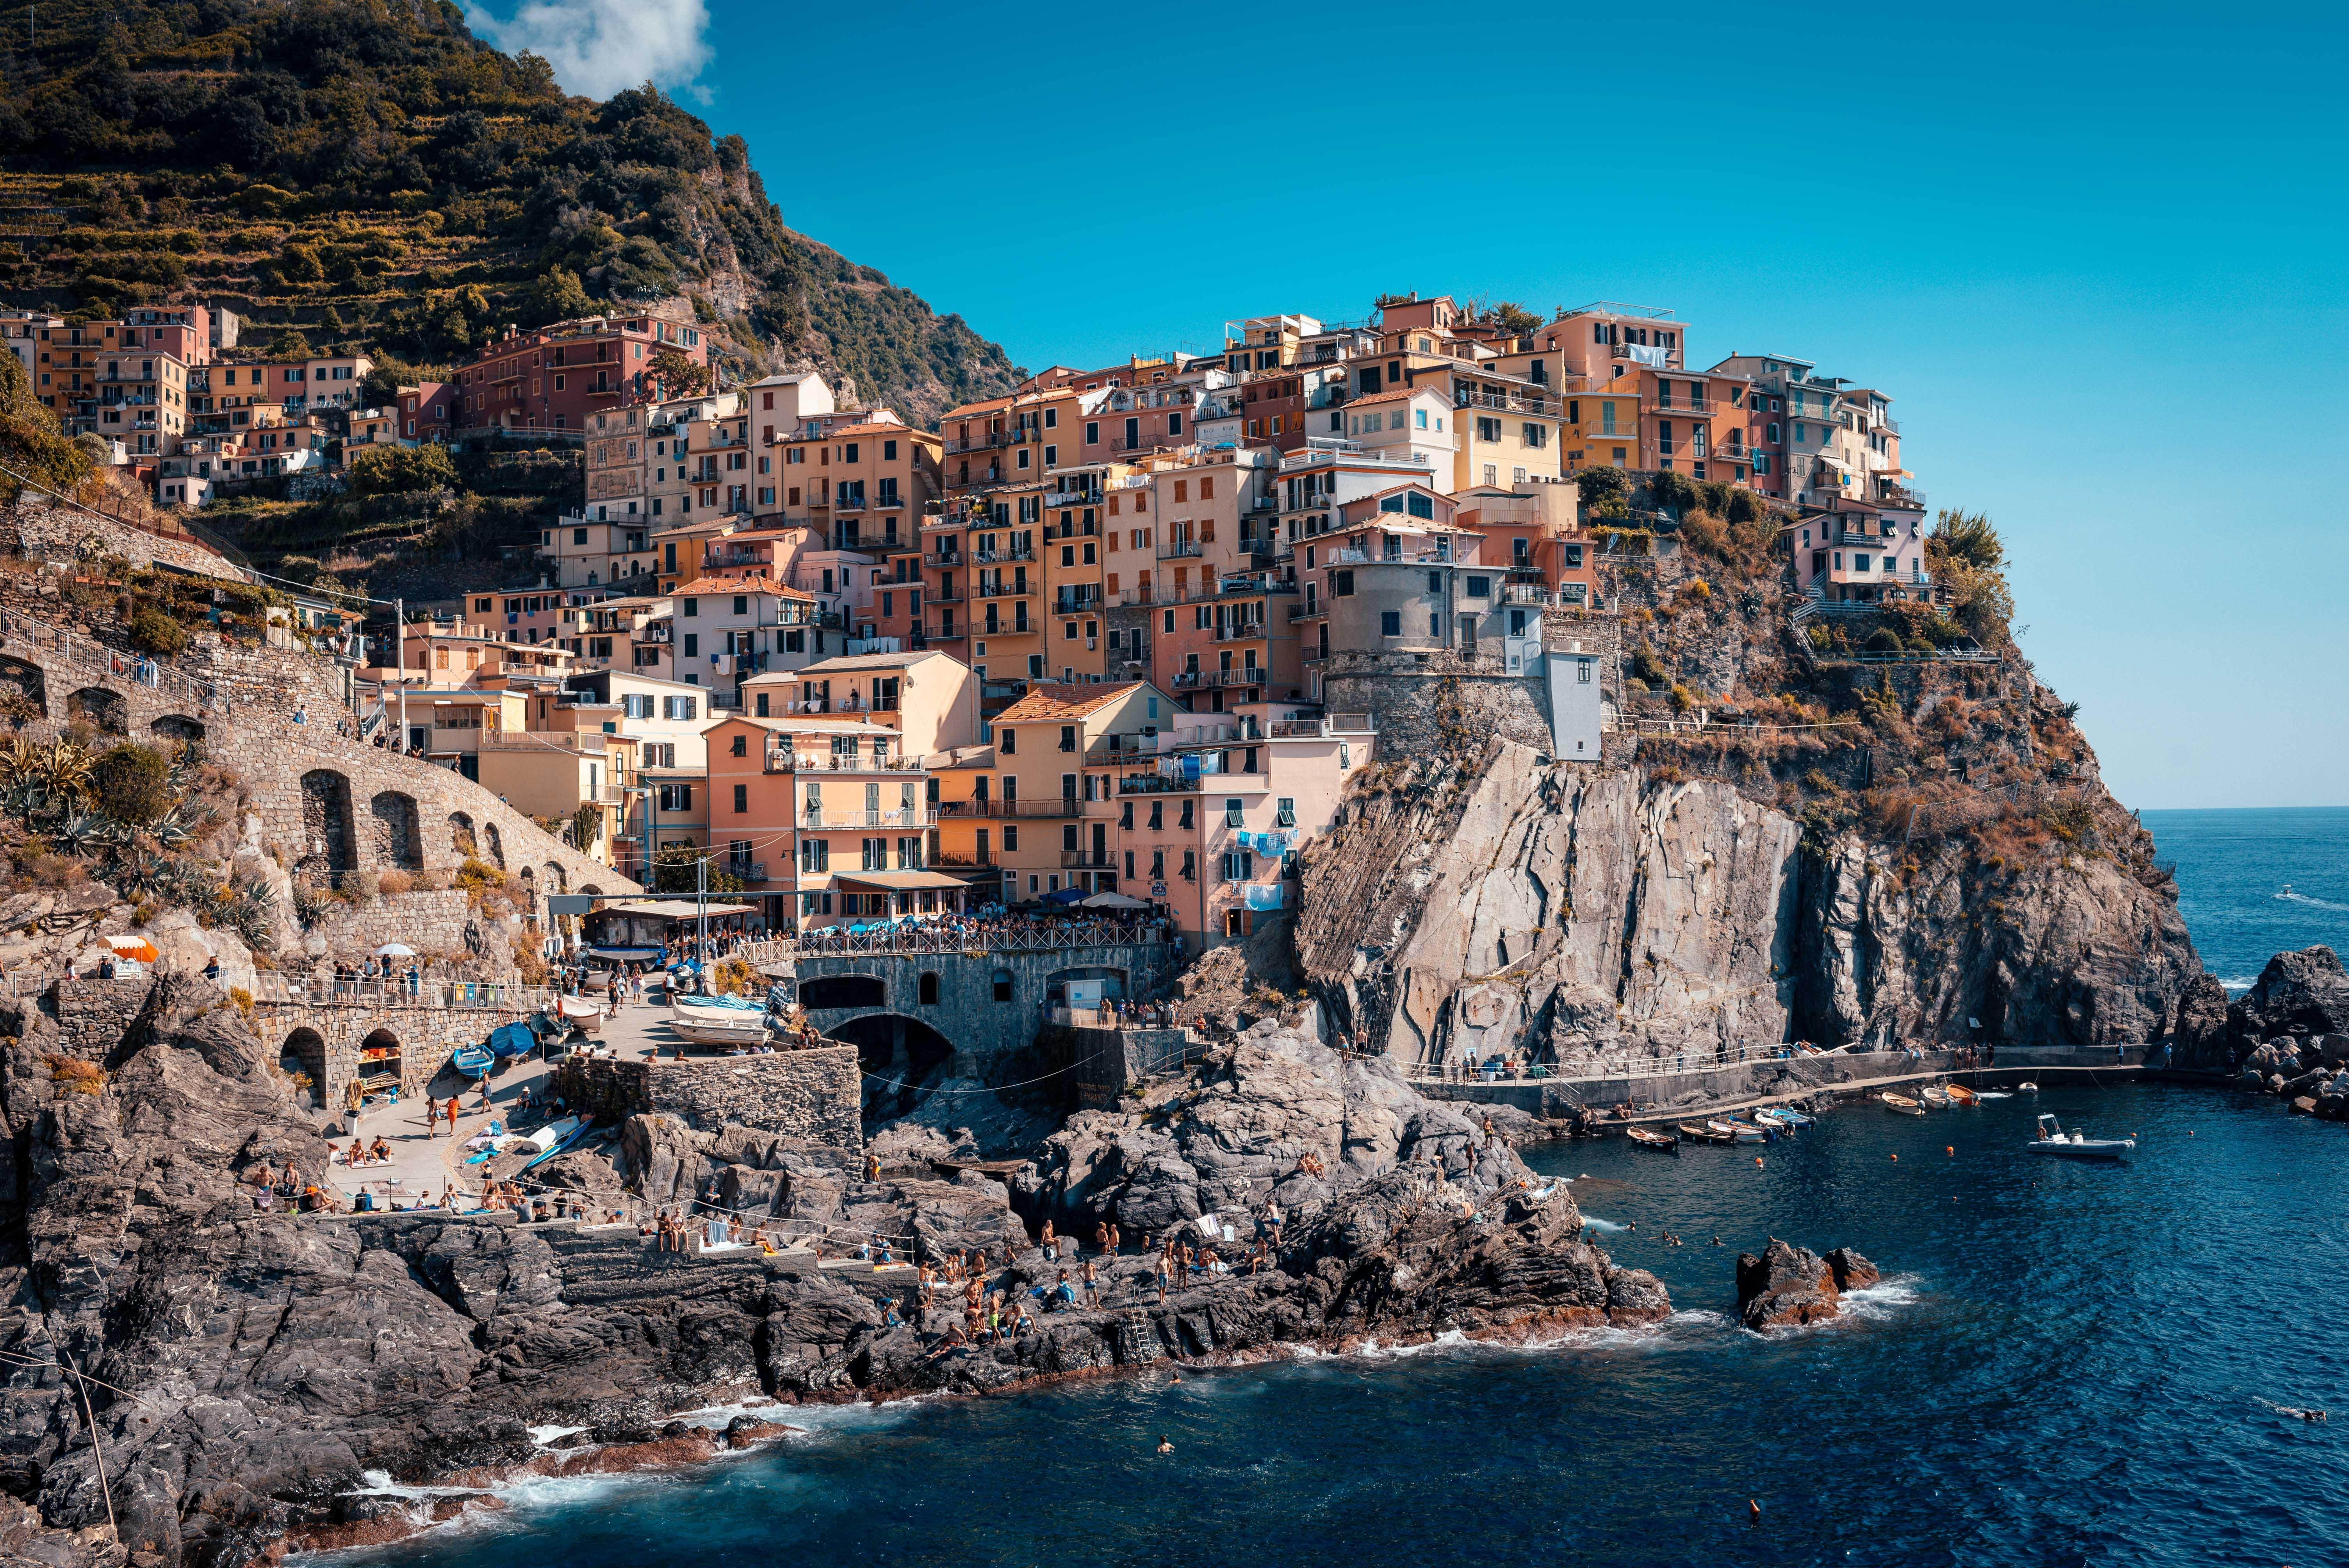 Italy Photo by Mathew Schwartz Cinque Terre